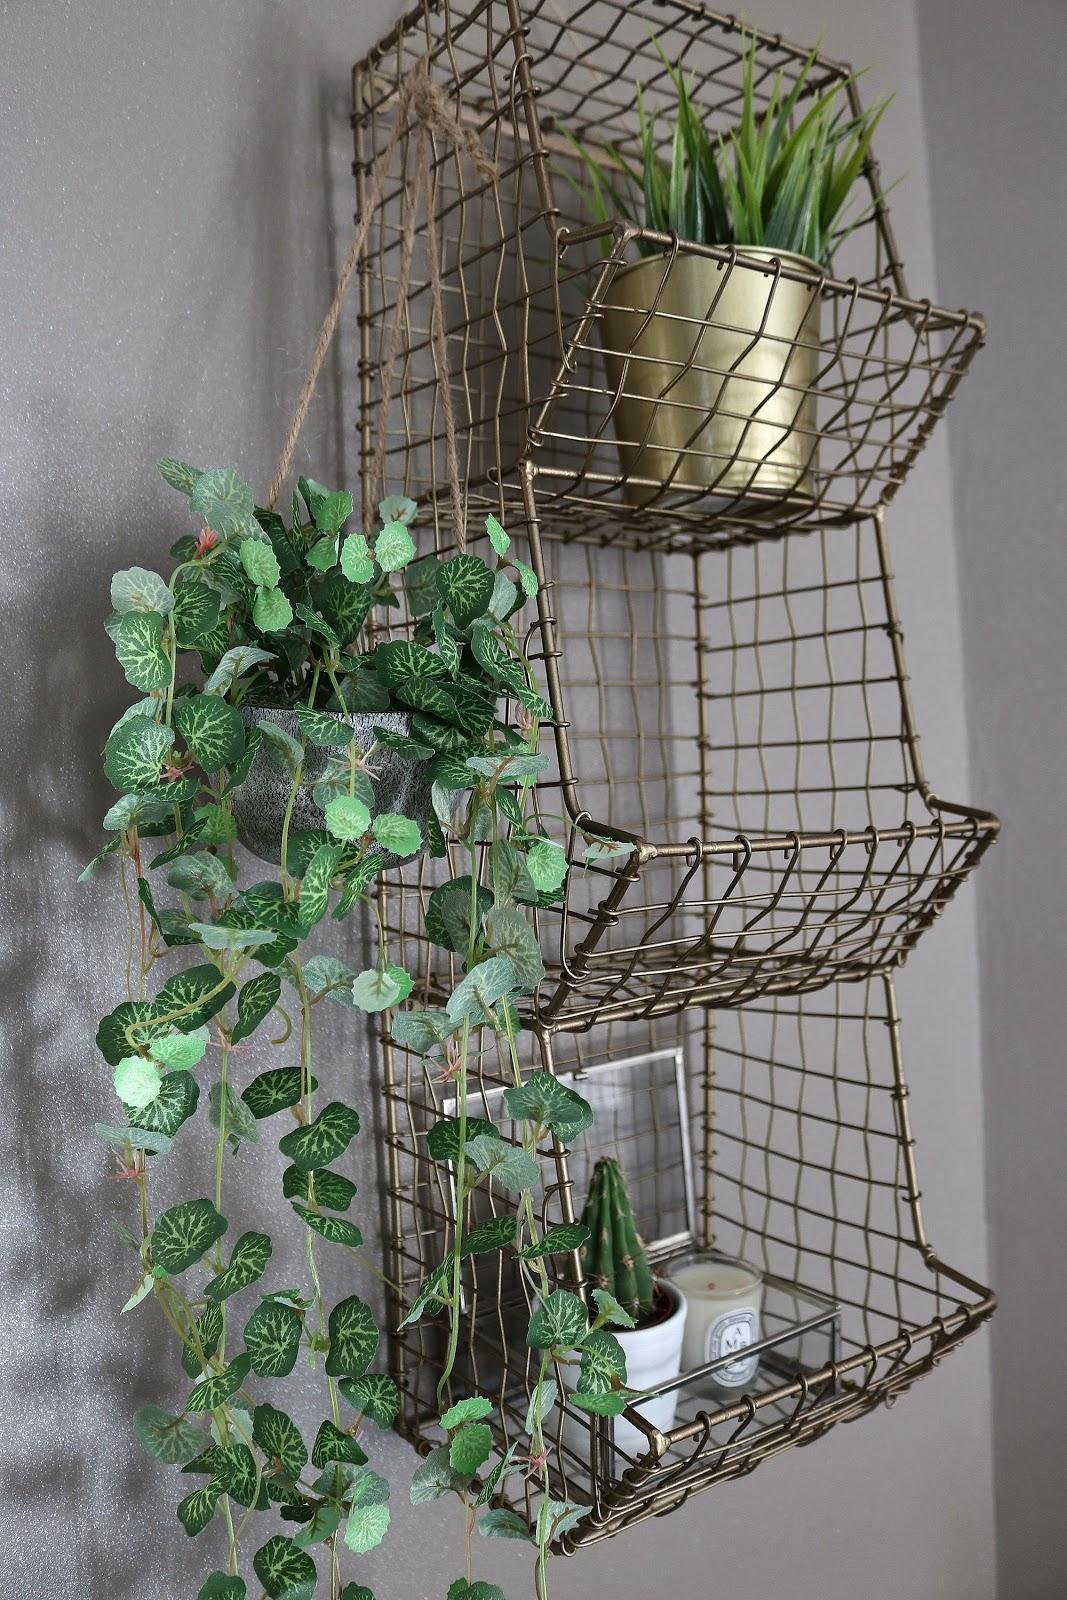 maison du monde plaisir adresse awesome retour en images. Black Bedroom Furniture Sets. Home Design Ideas